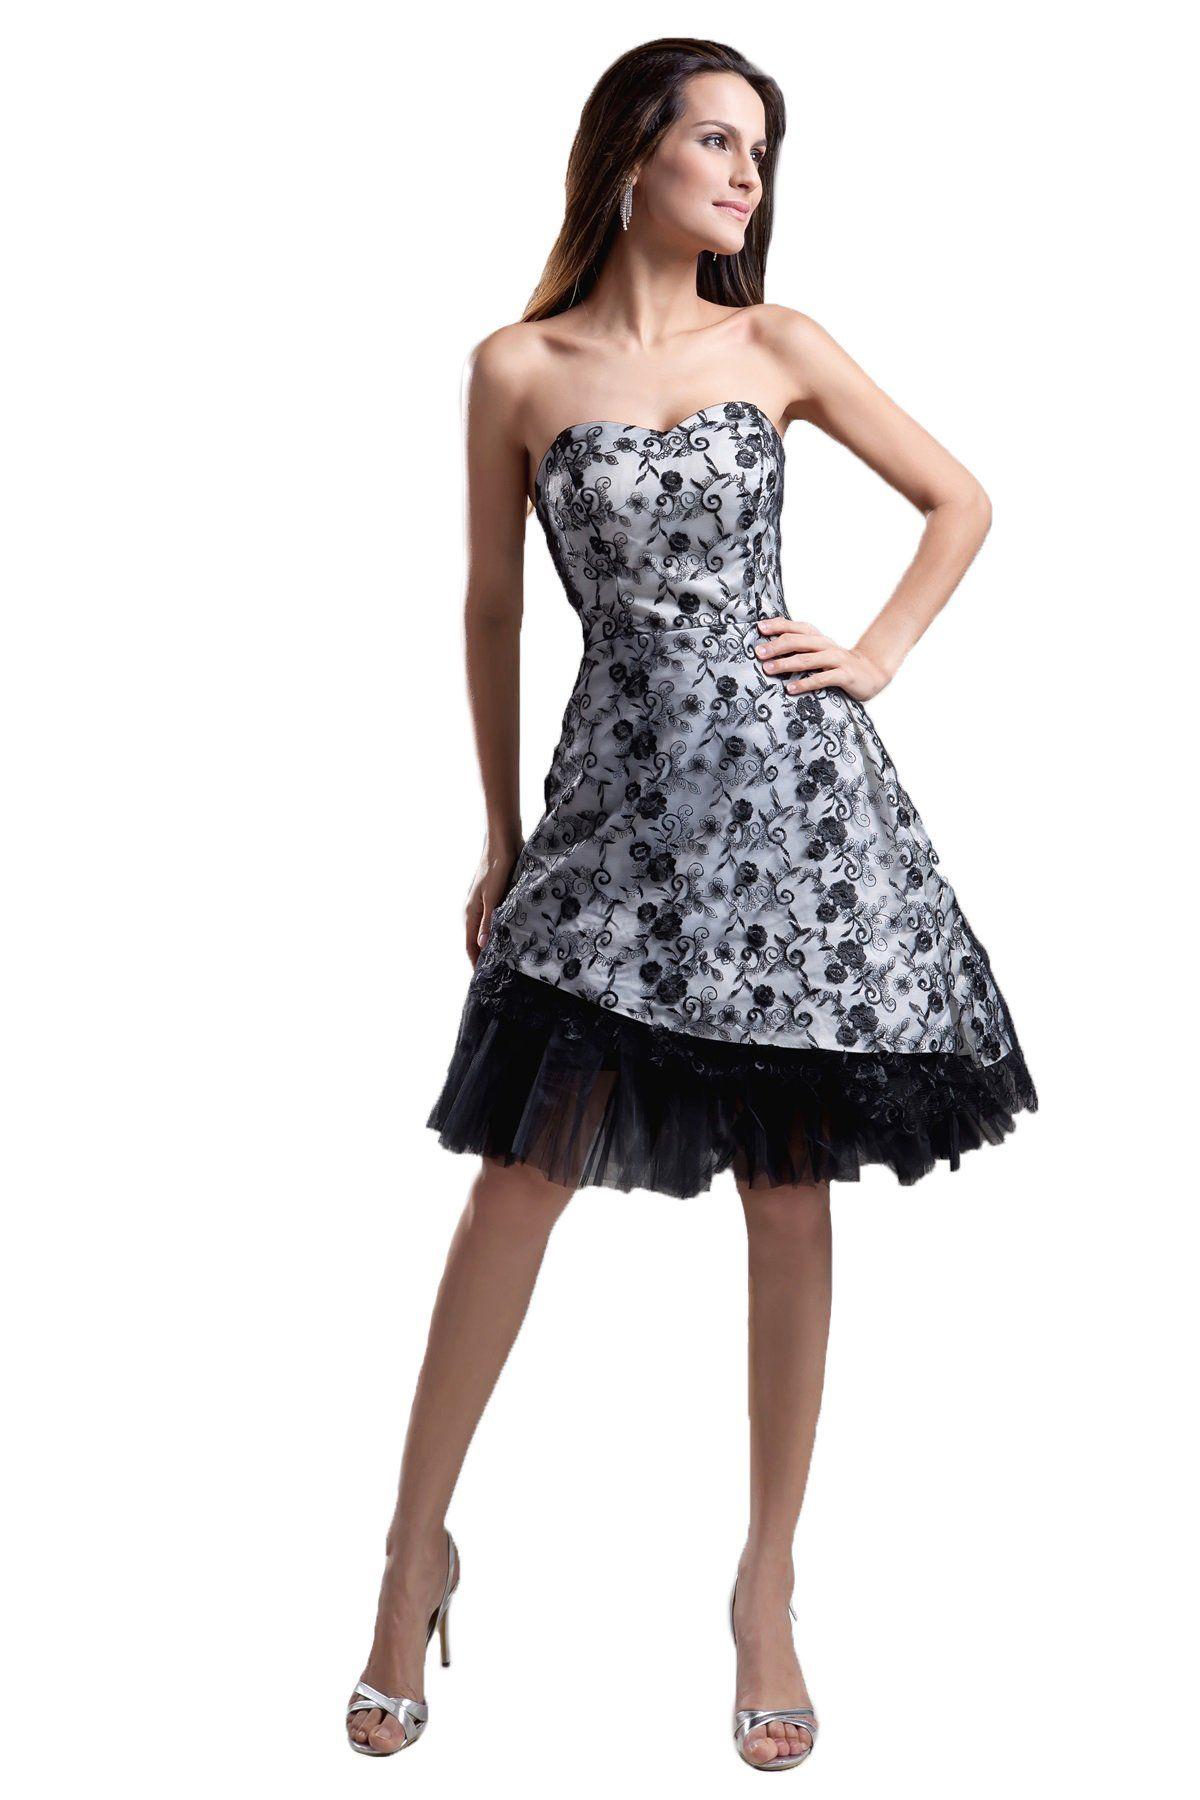 Snowskite womenus sweetheart short black lace prom formal cocktail